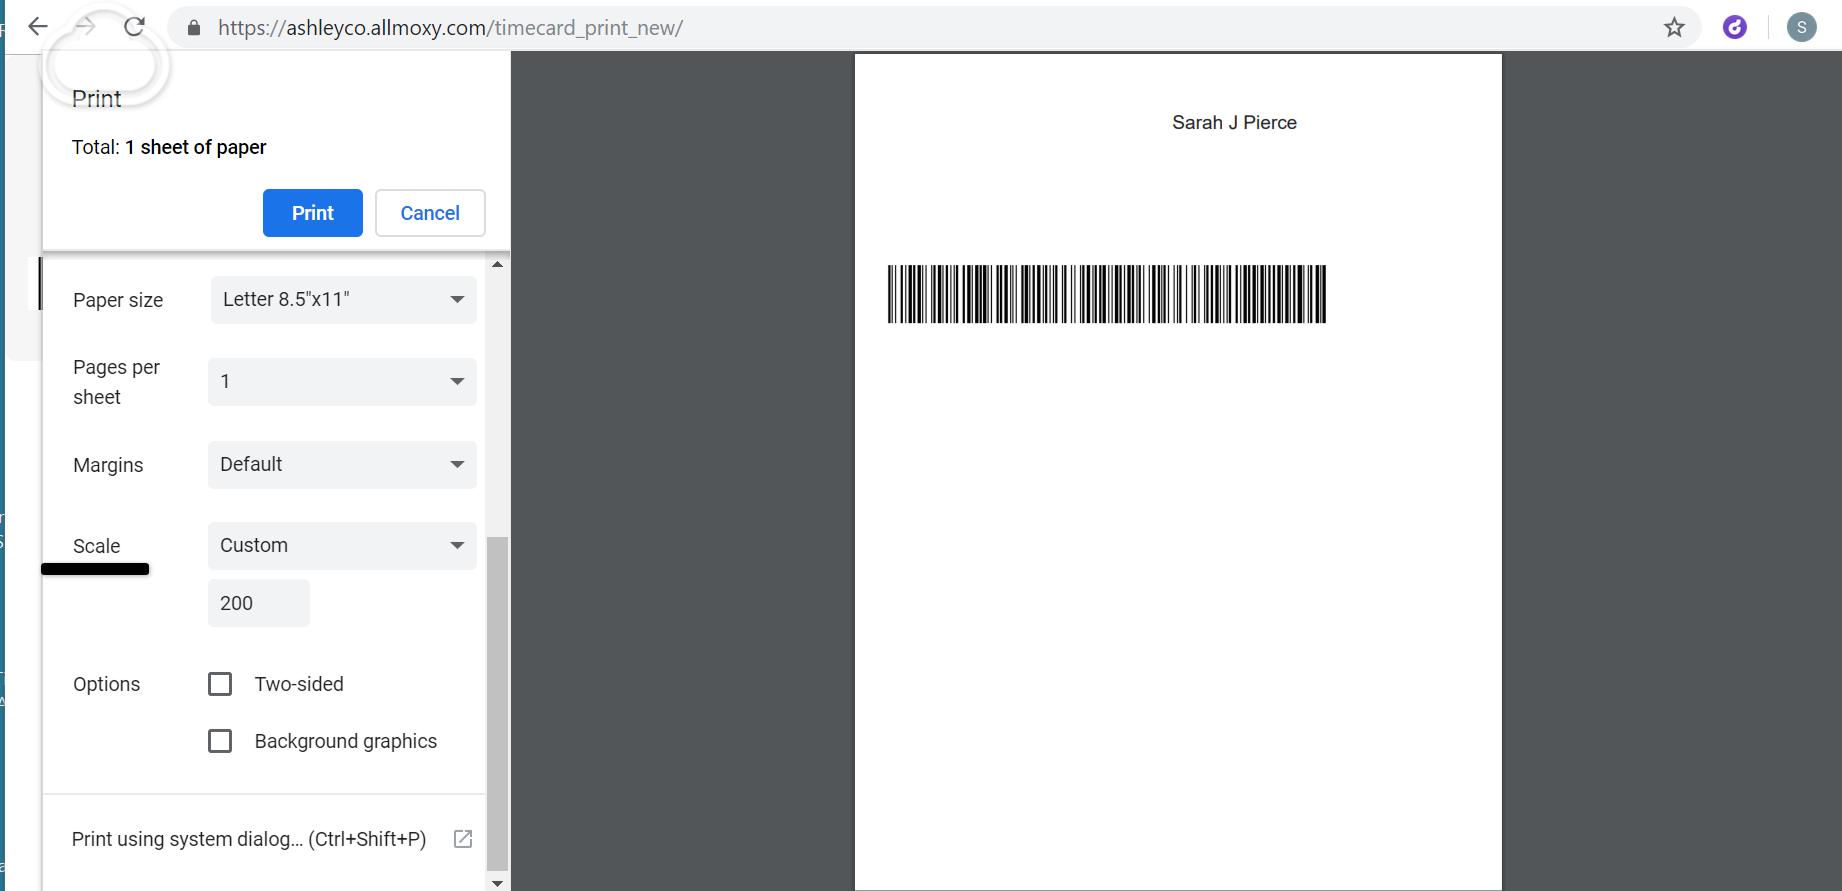 Printer Settings for Timecard